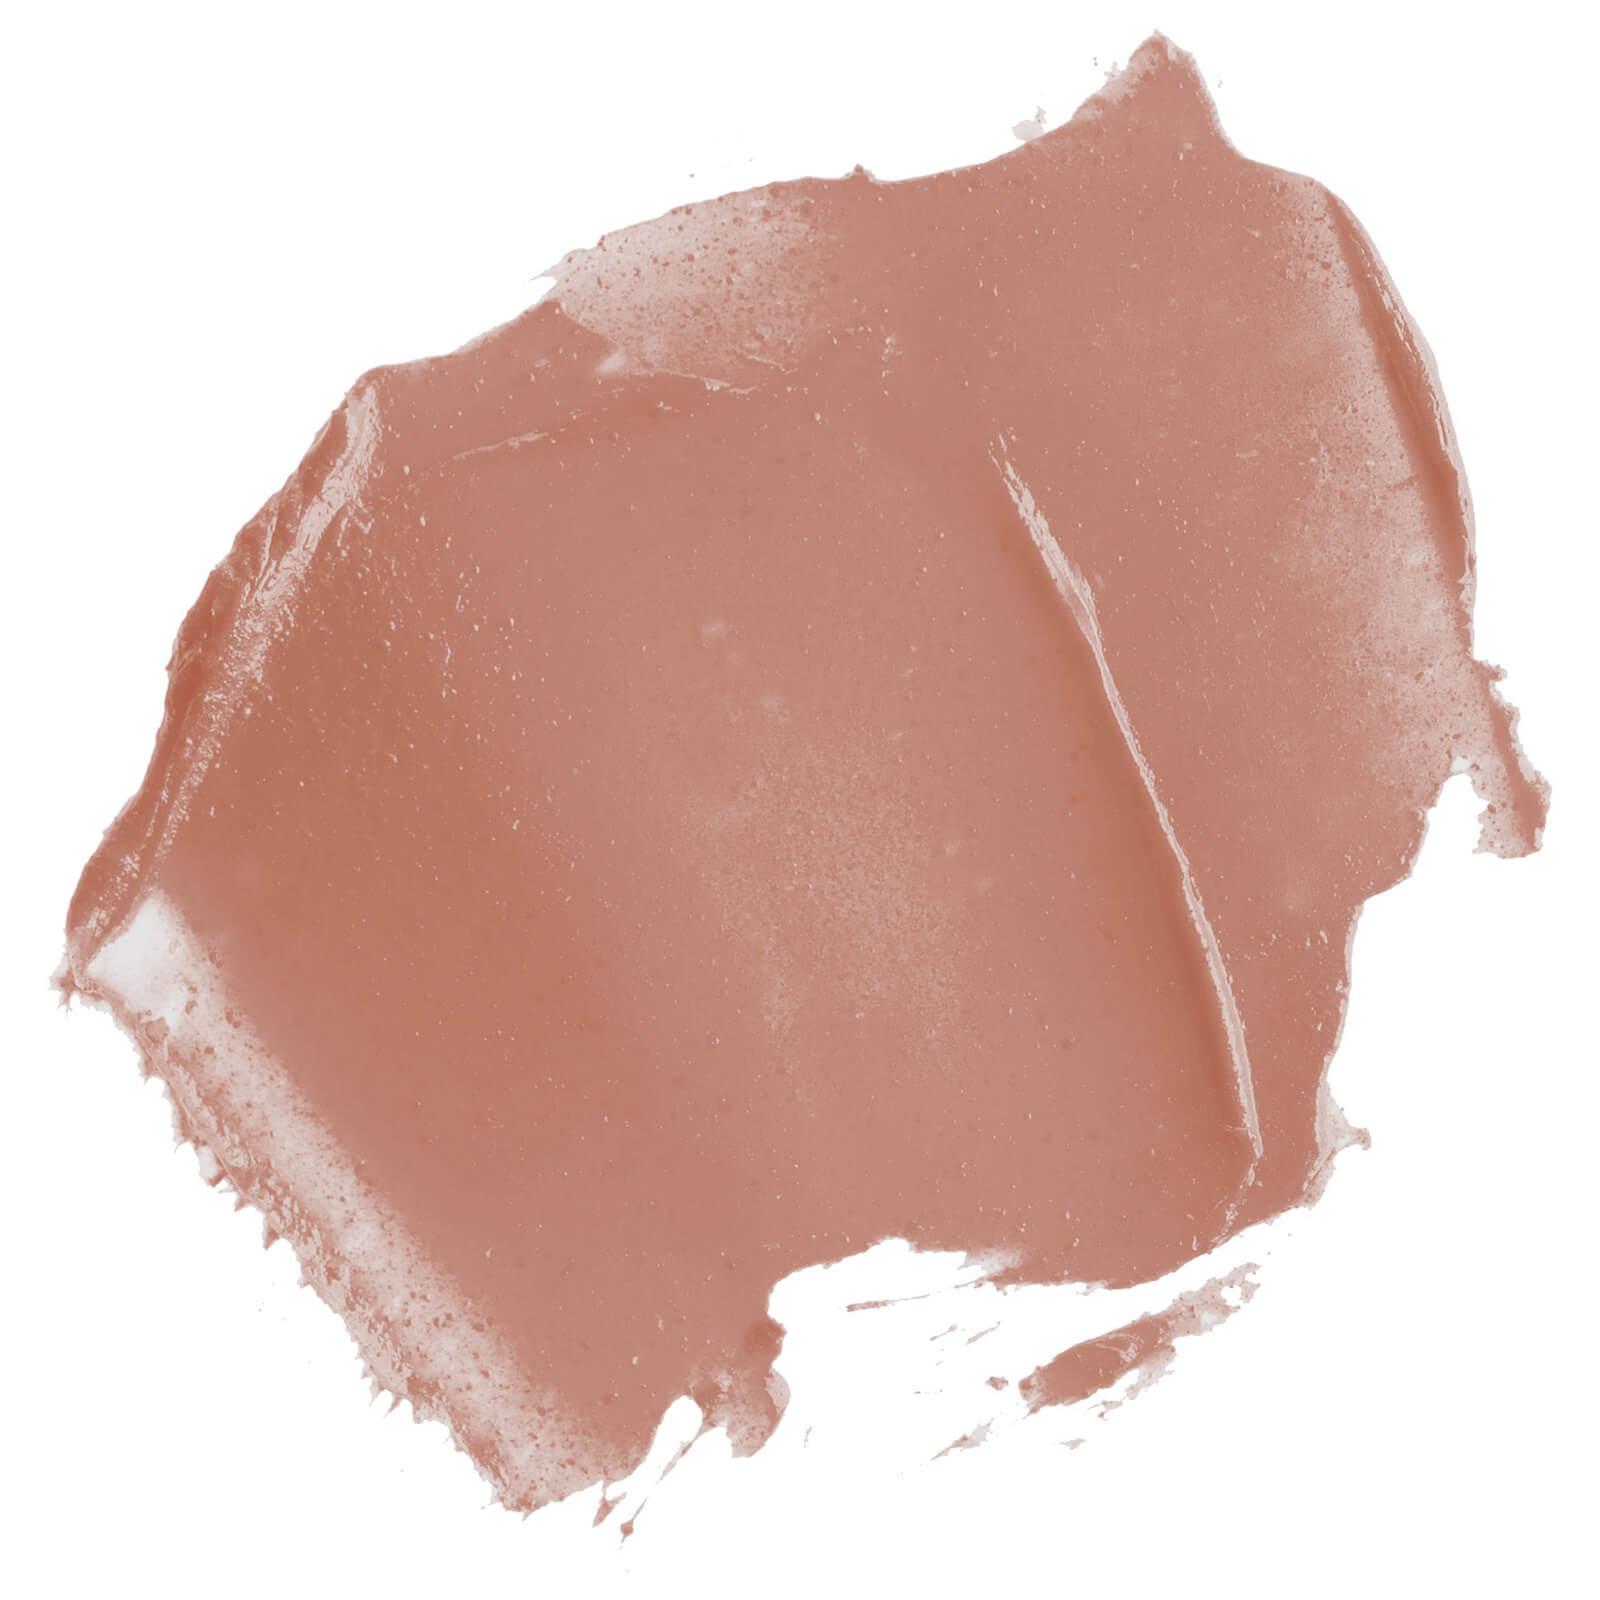 Купить Stila Color Balm Lipstick 3g (Various Shades) - Jessie